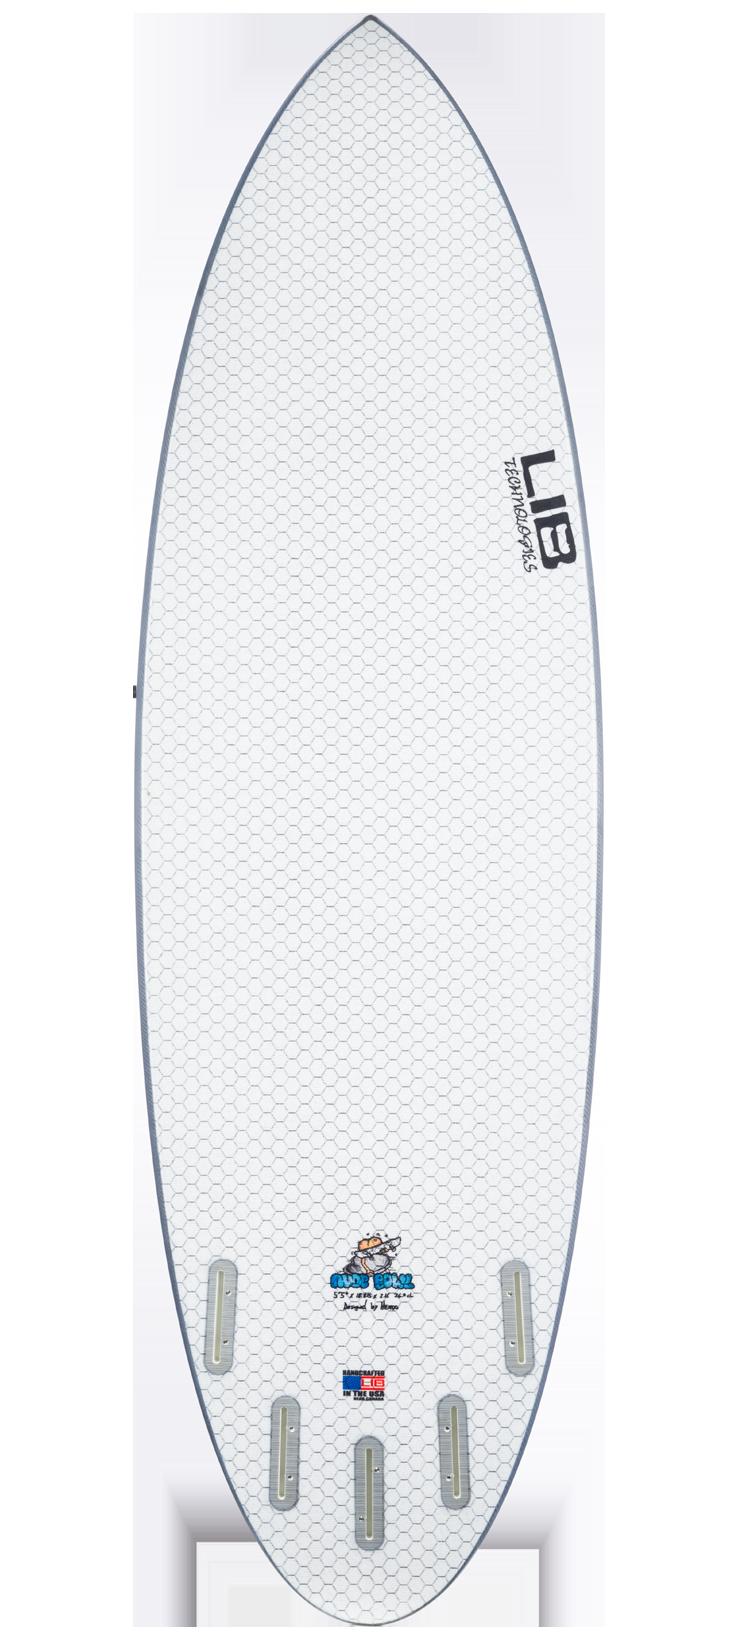 nude-bowl-lib-tech-surfboard-base-738x1640